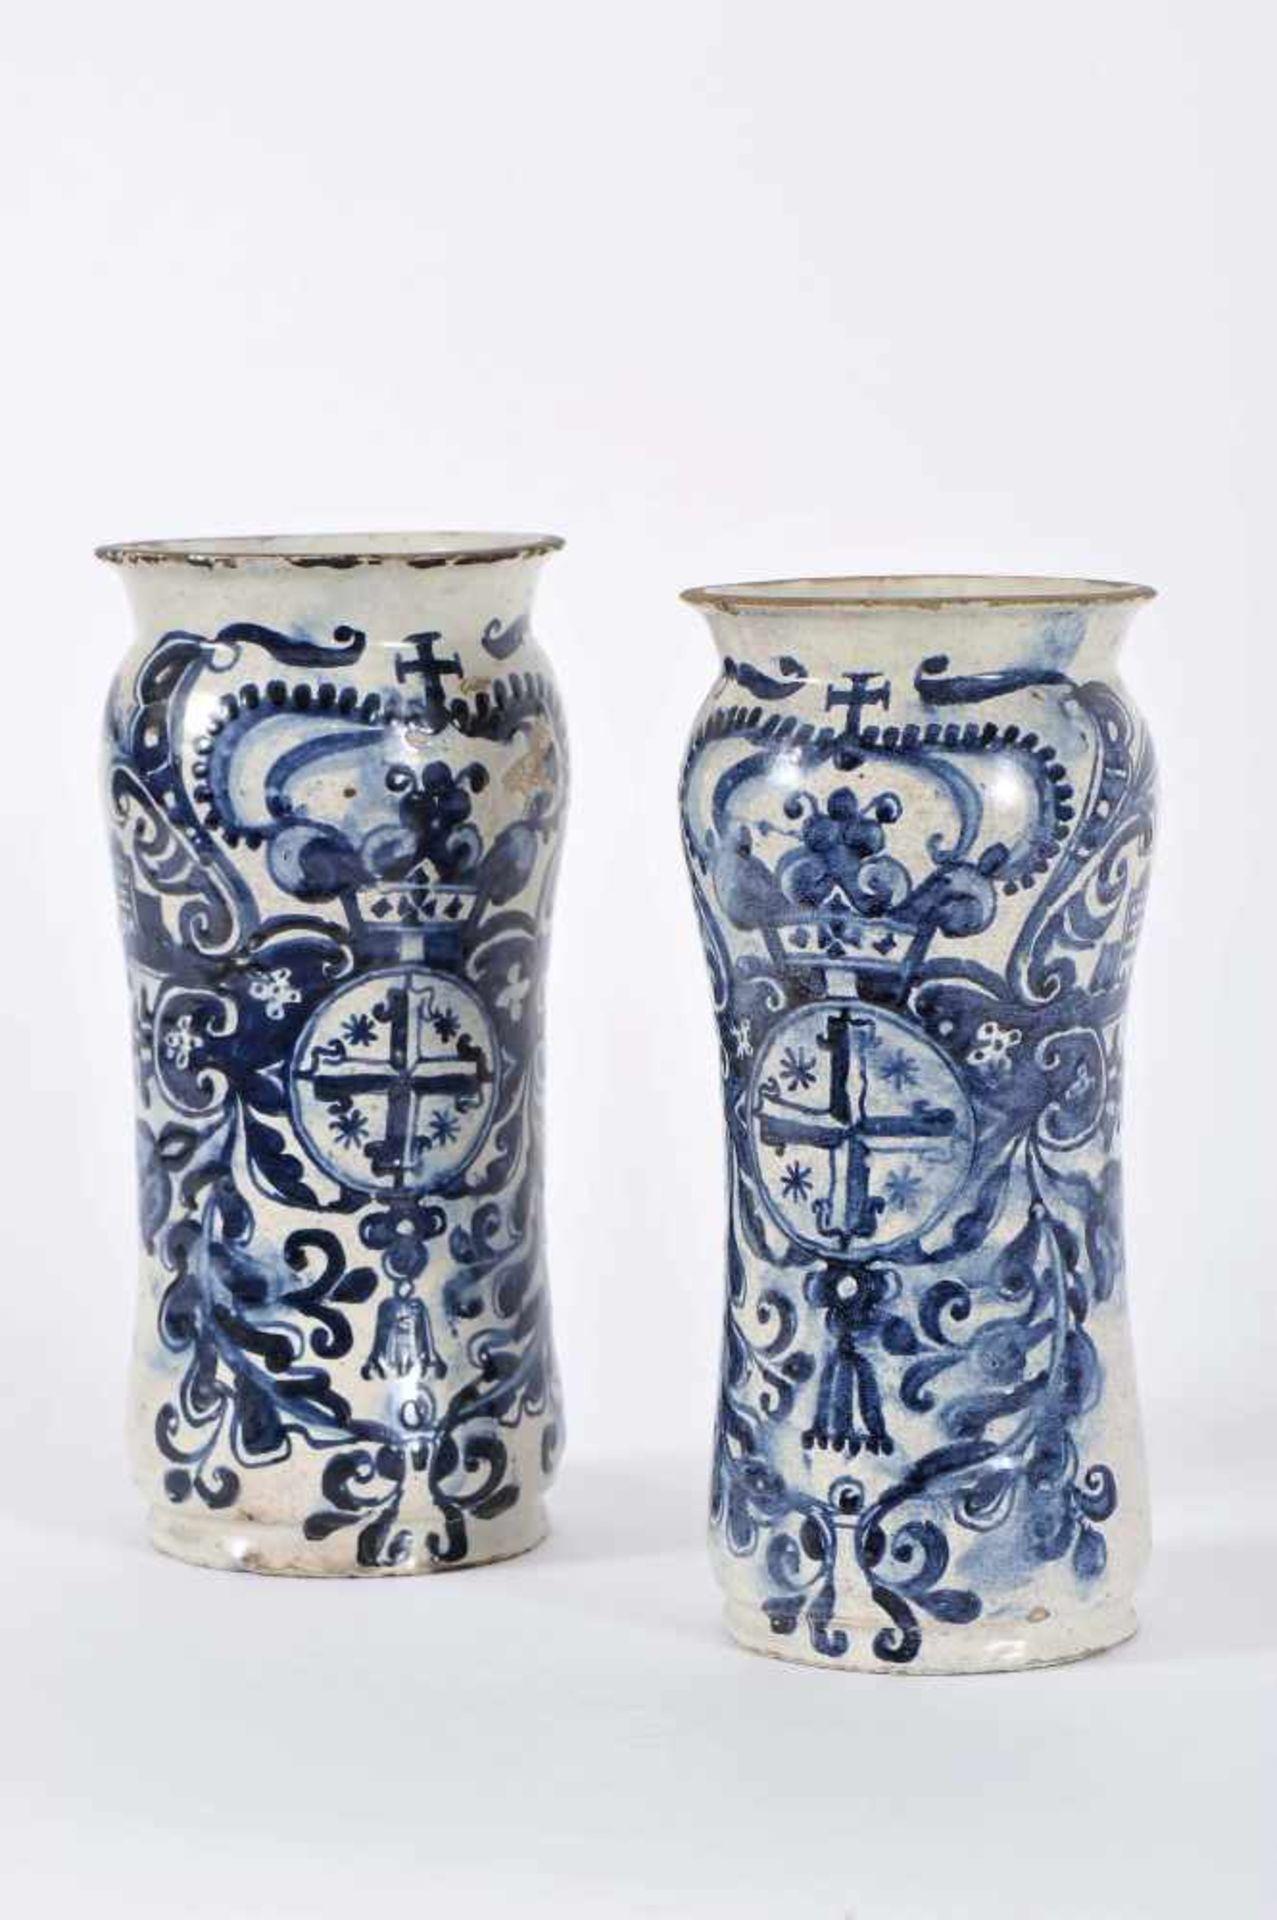 Los 67 - A Pair of Pharmacy PotsA Pair of Pharmacy Pots, faience, blue «Barroque cartouche» decoration...